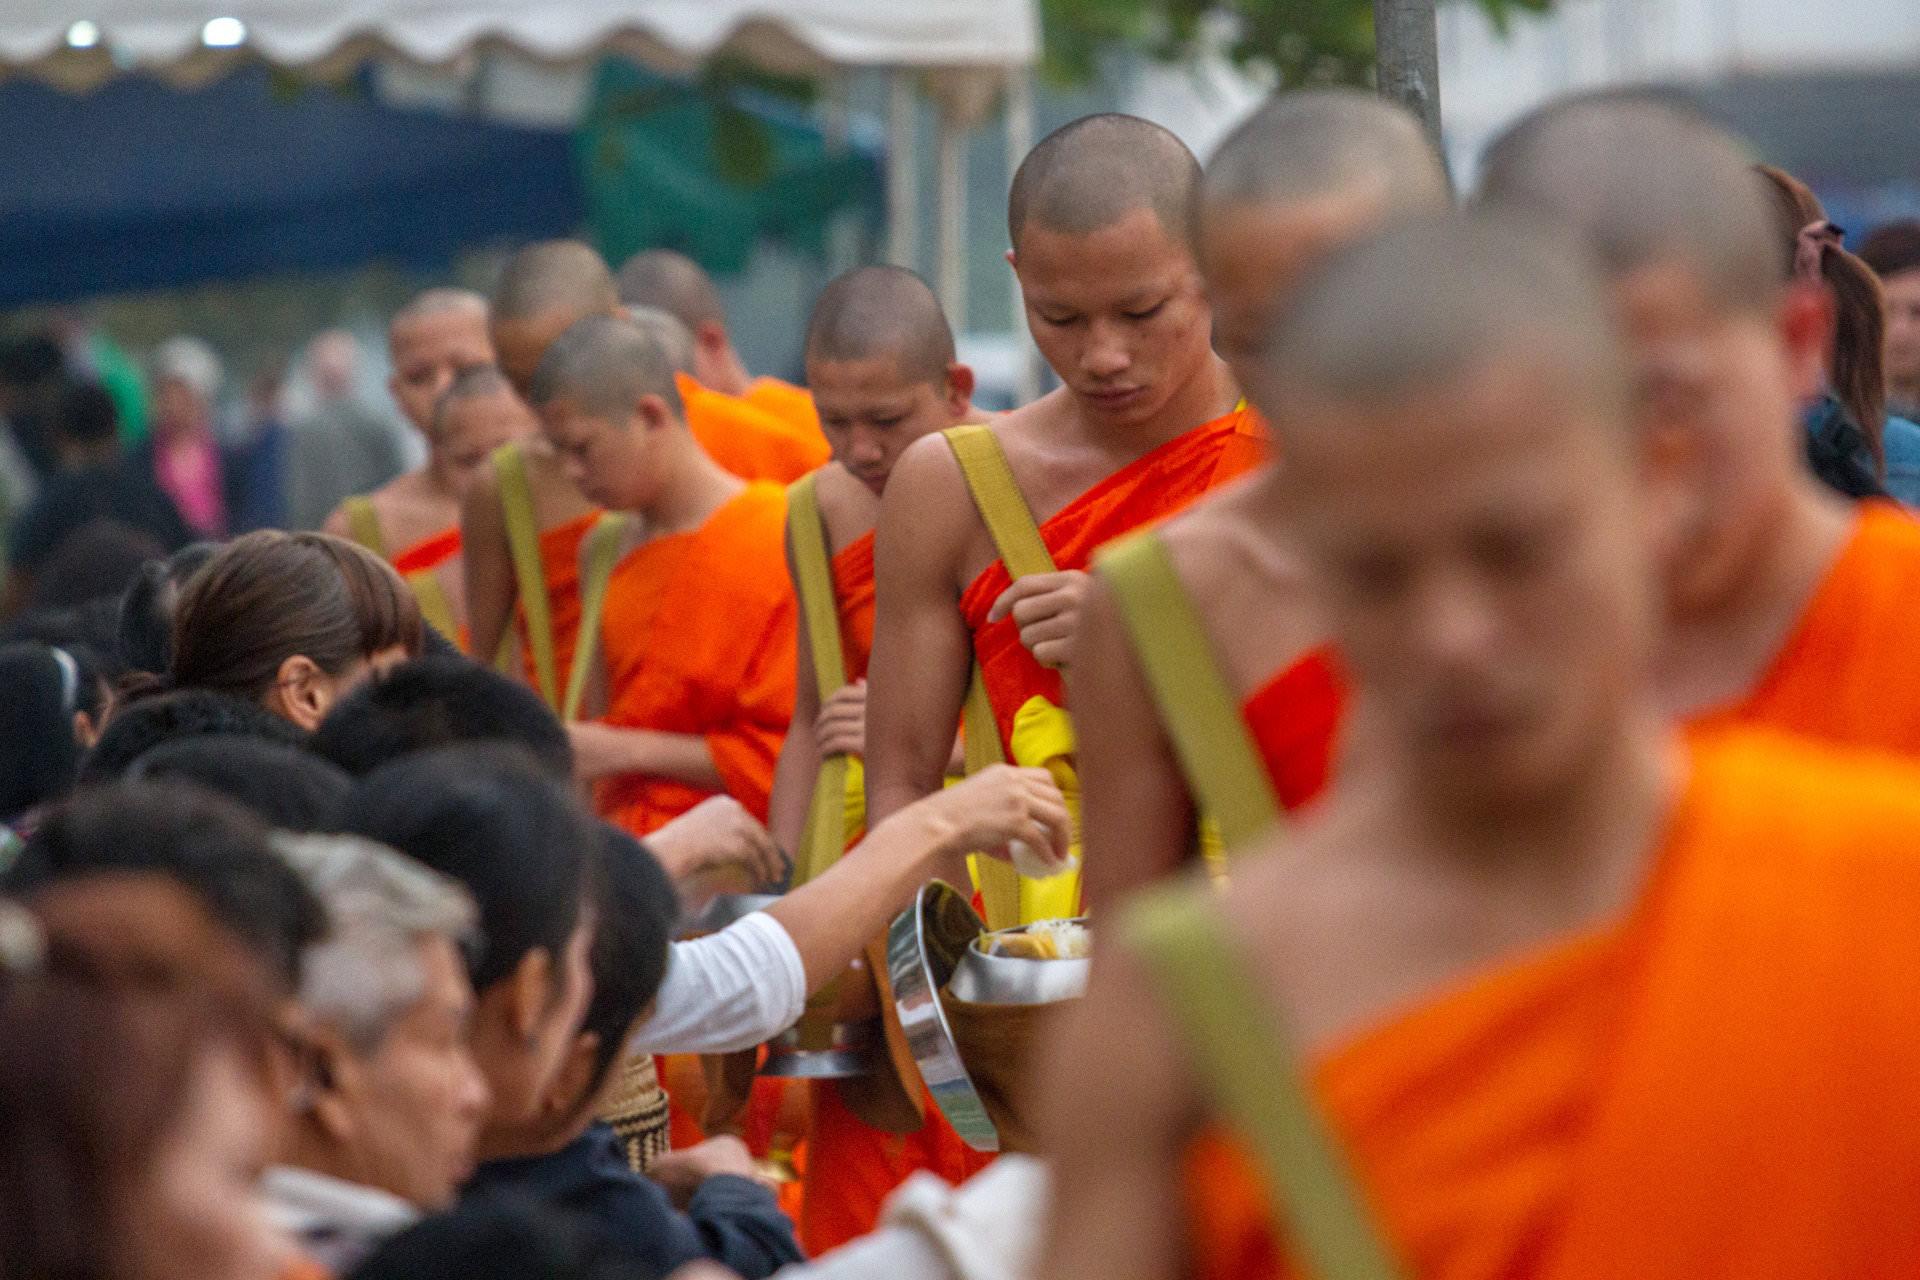 Mönche Luang Prabang